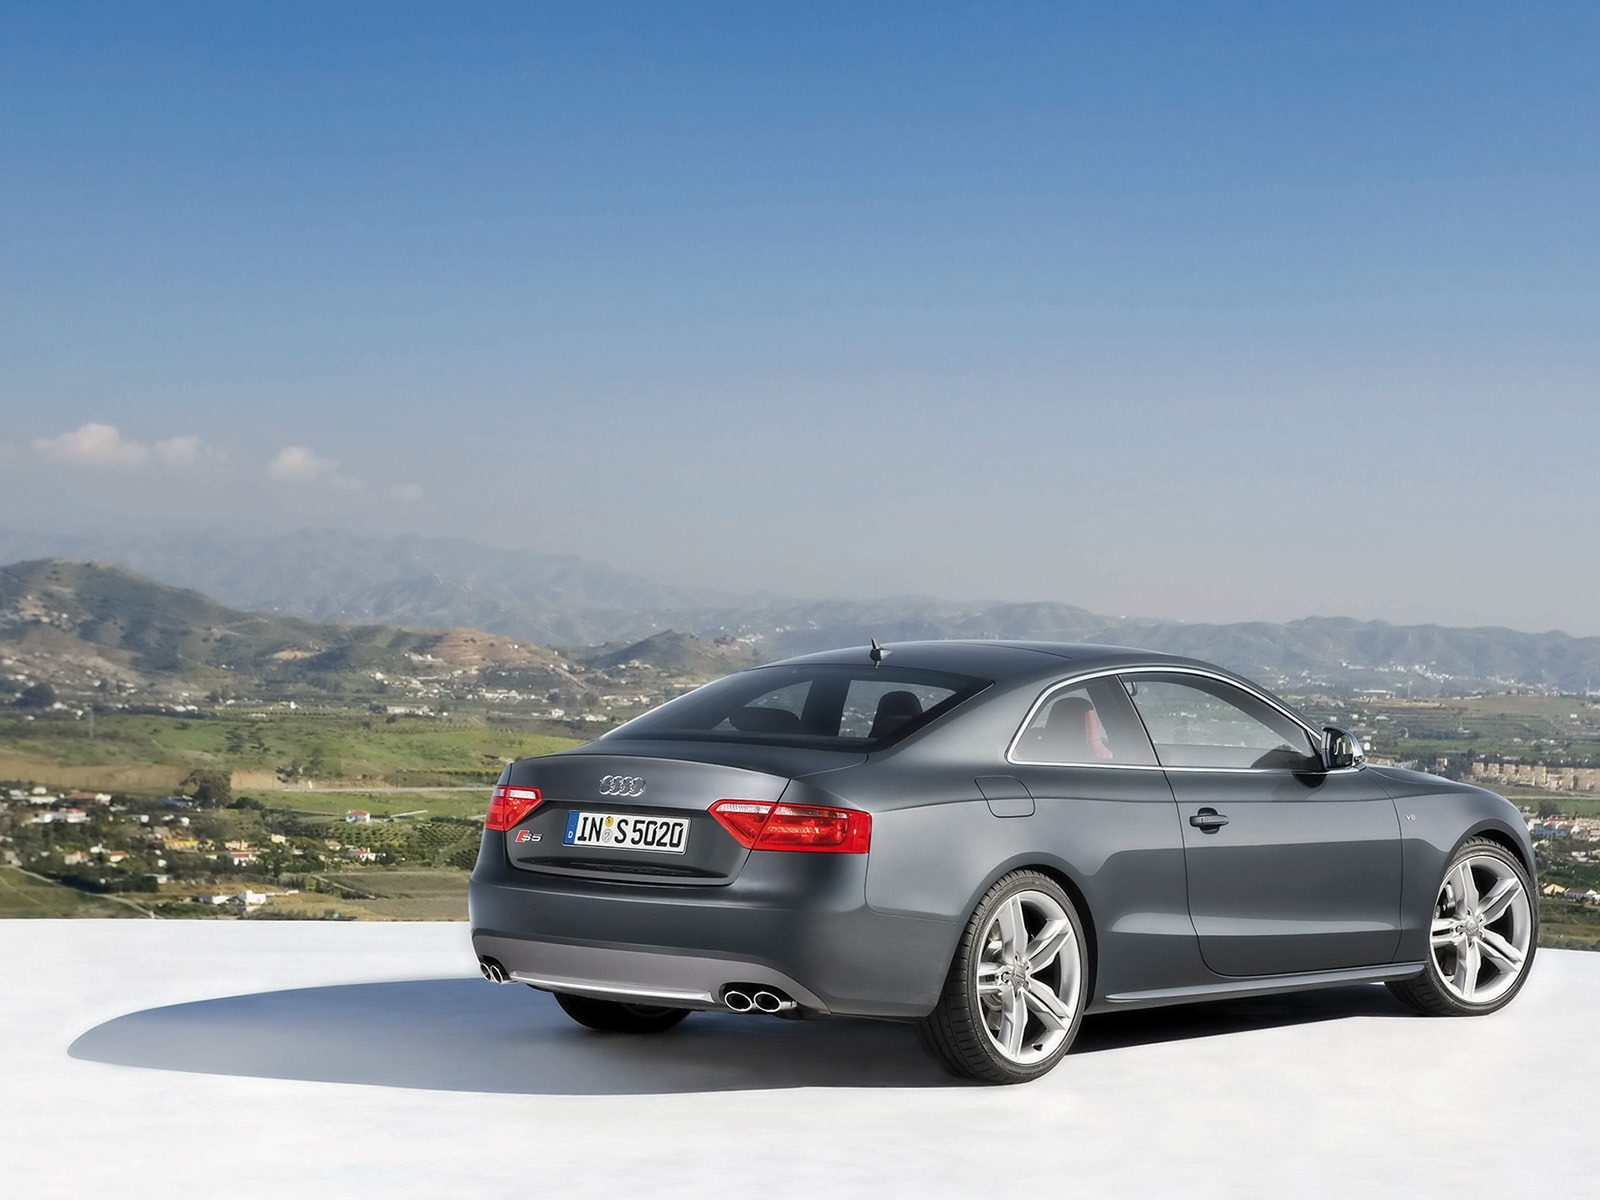 Audi S5 Wallpaper Audi Cars Wallpapers In Jpg Format For Free Download